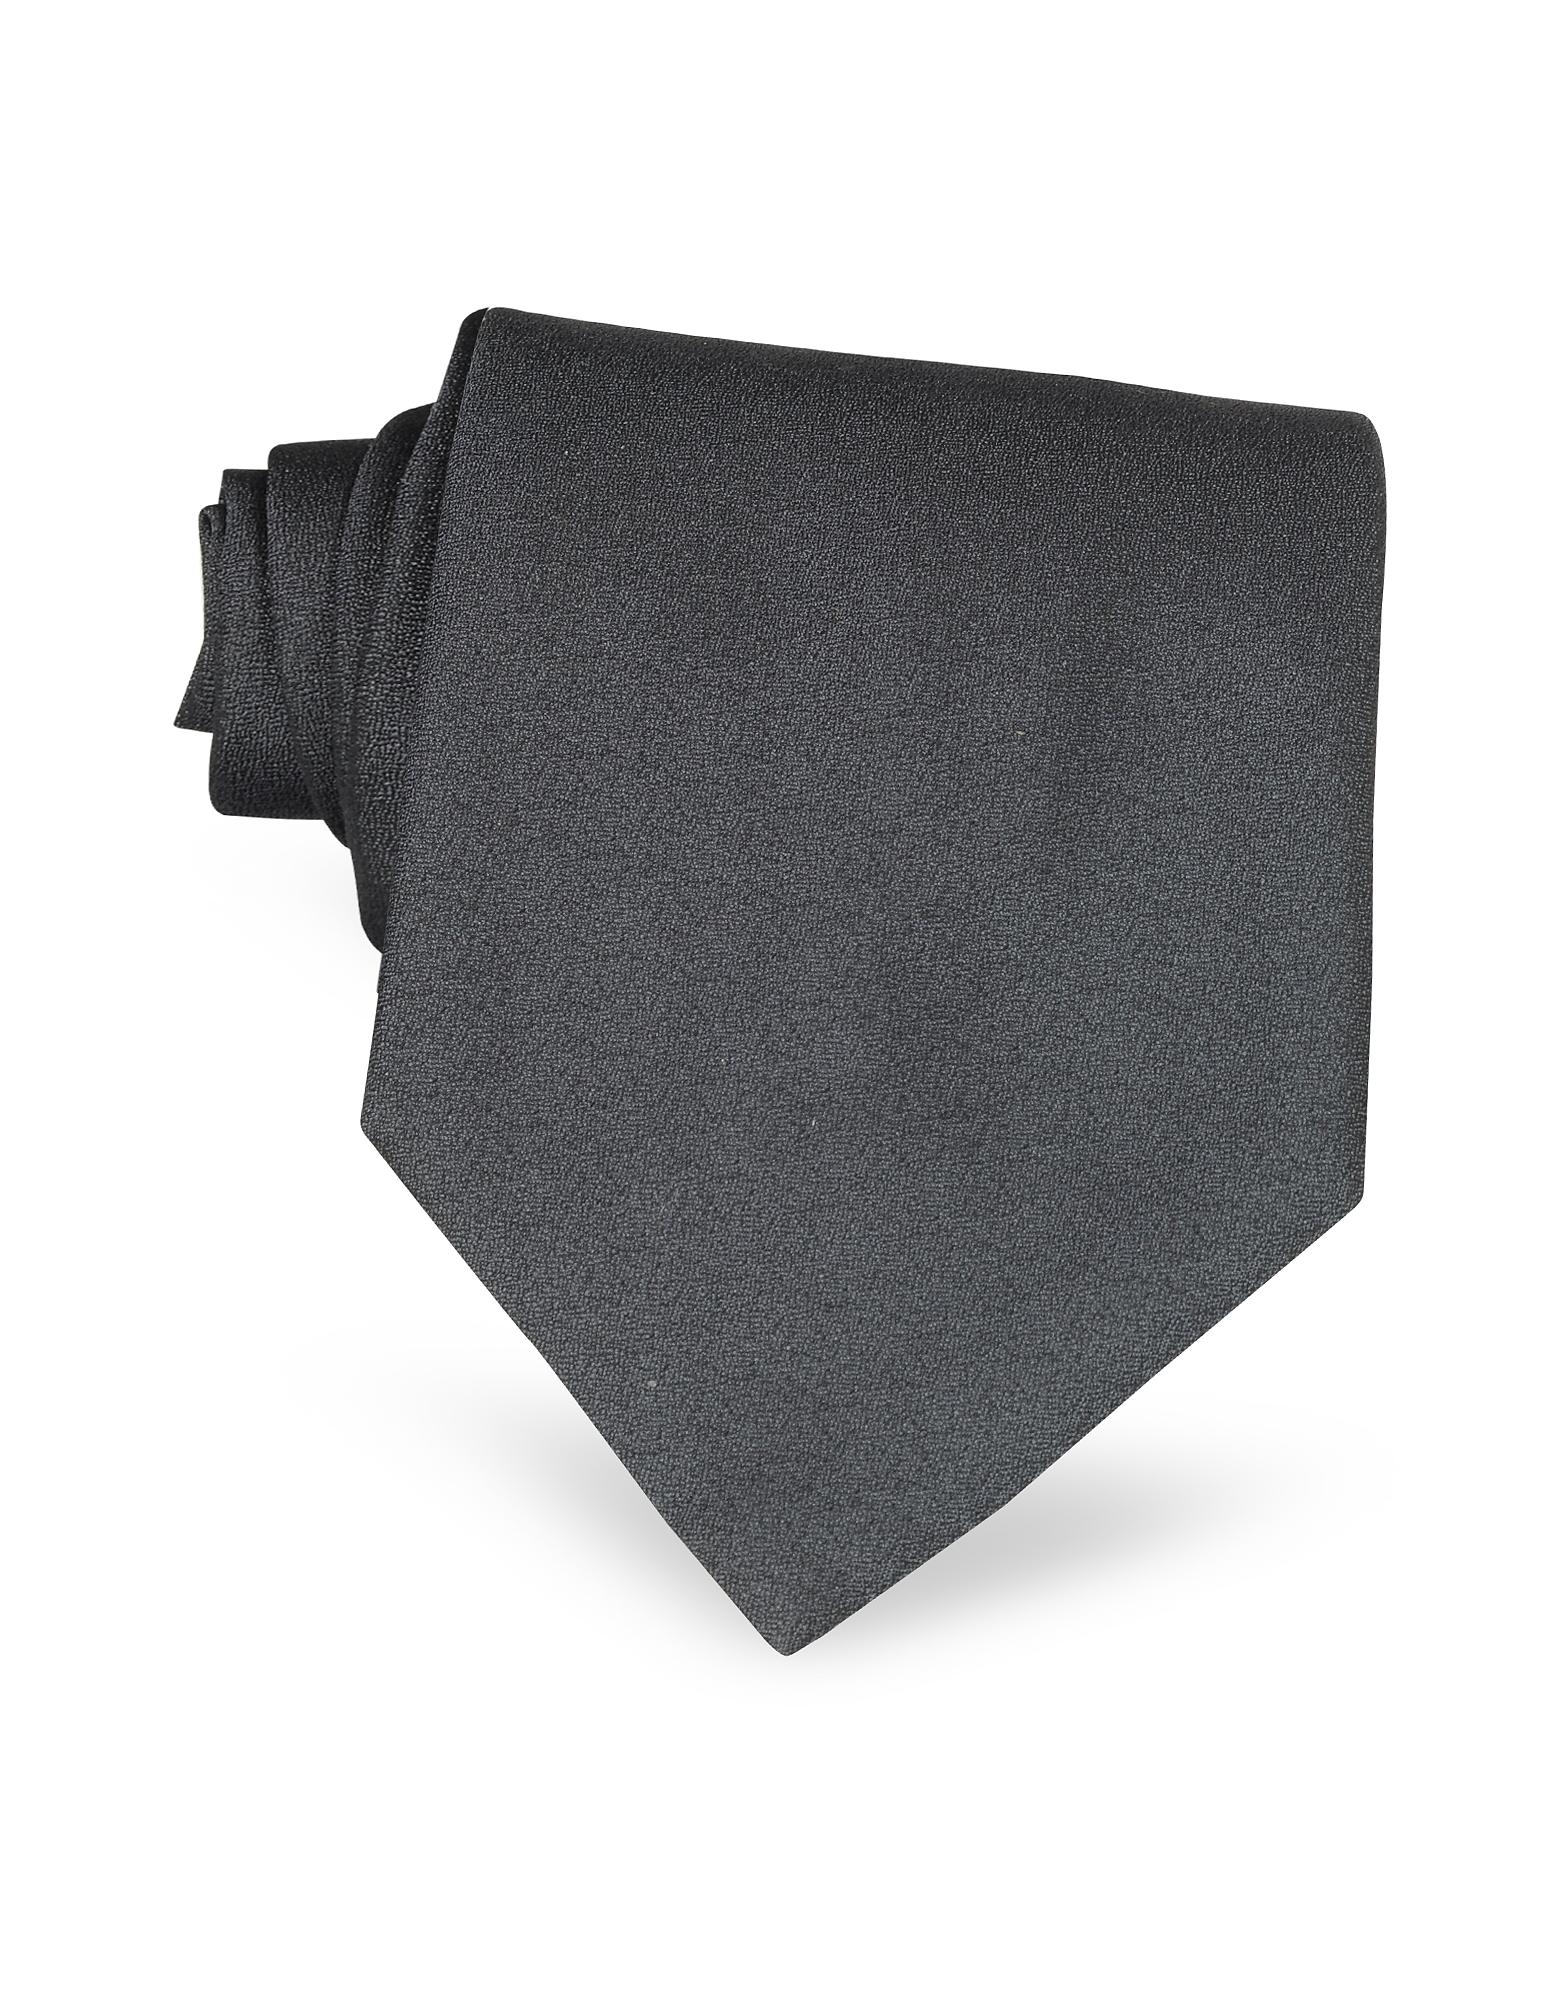 Forzieri Designer Ties, Ponte Vecchio Old Bridge Dark Gray Woven Silk Tie